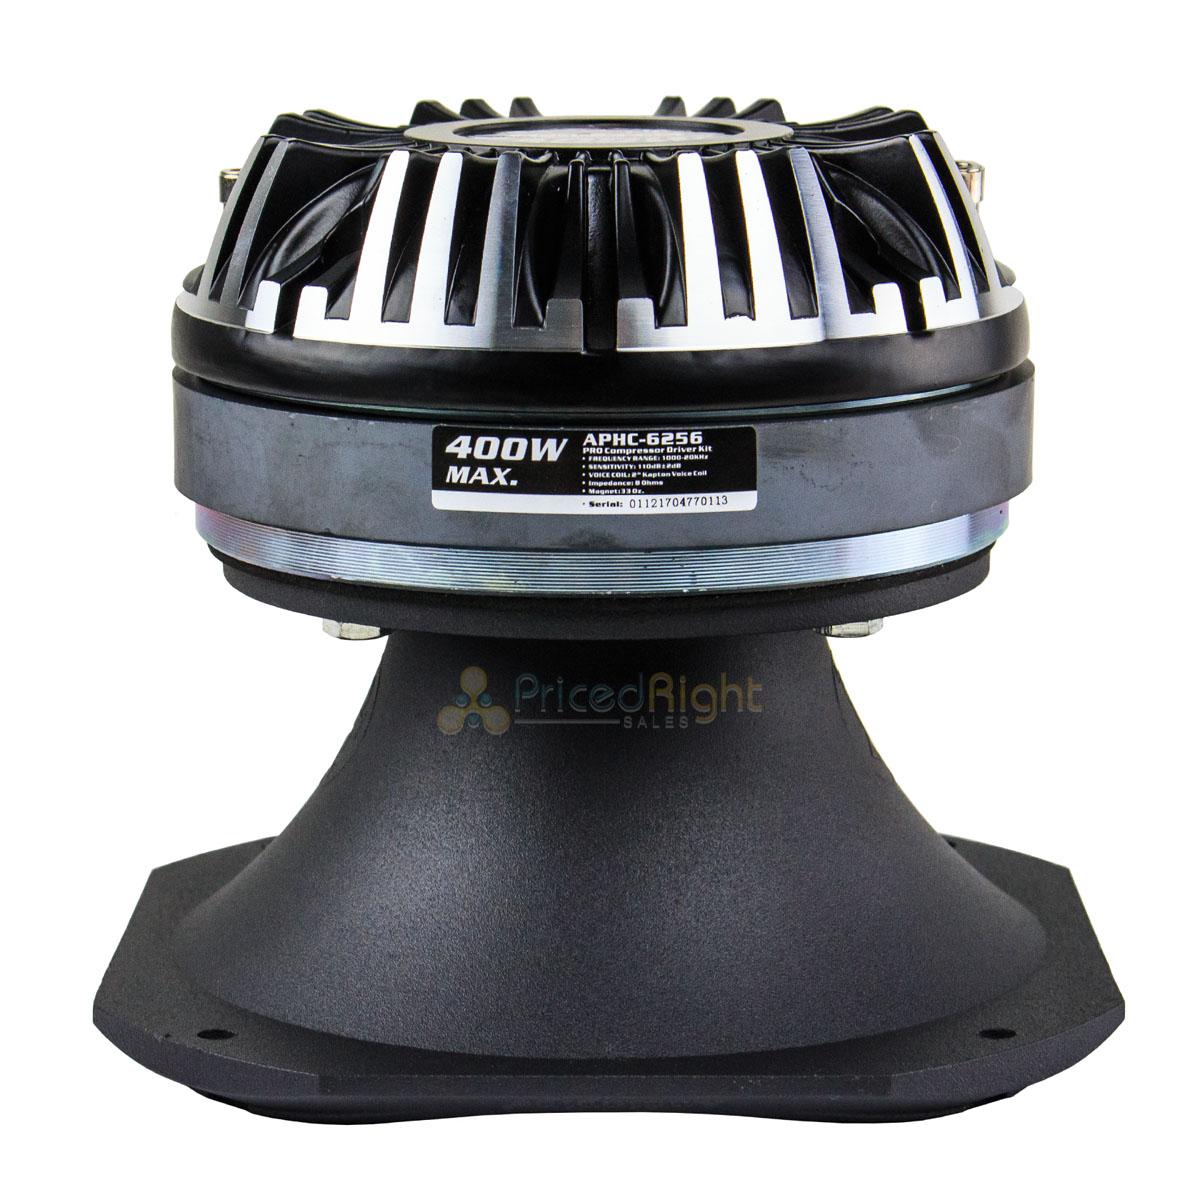 "AUDIOPIPE APHC-6256 Audiopipe Pro Compressor Driver Kit 400W 6.2/"" Each"